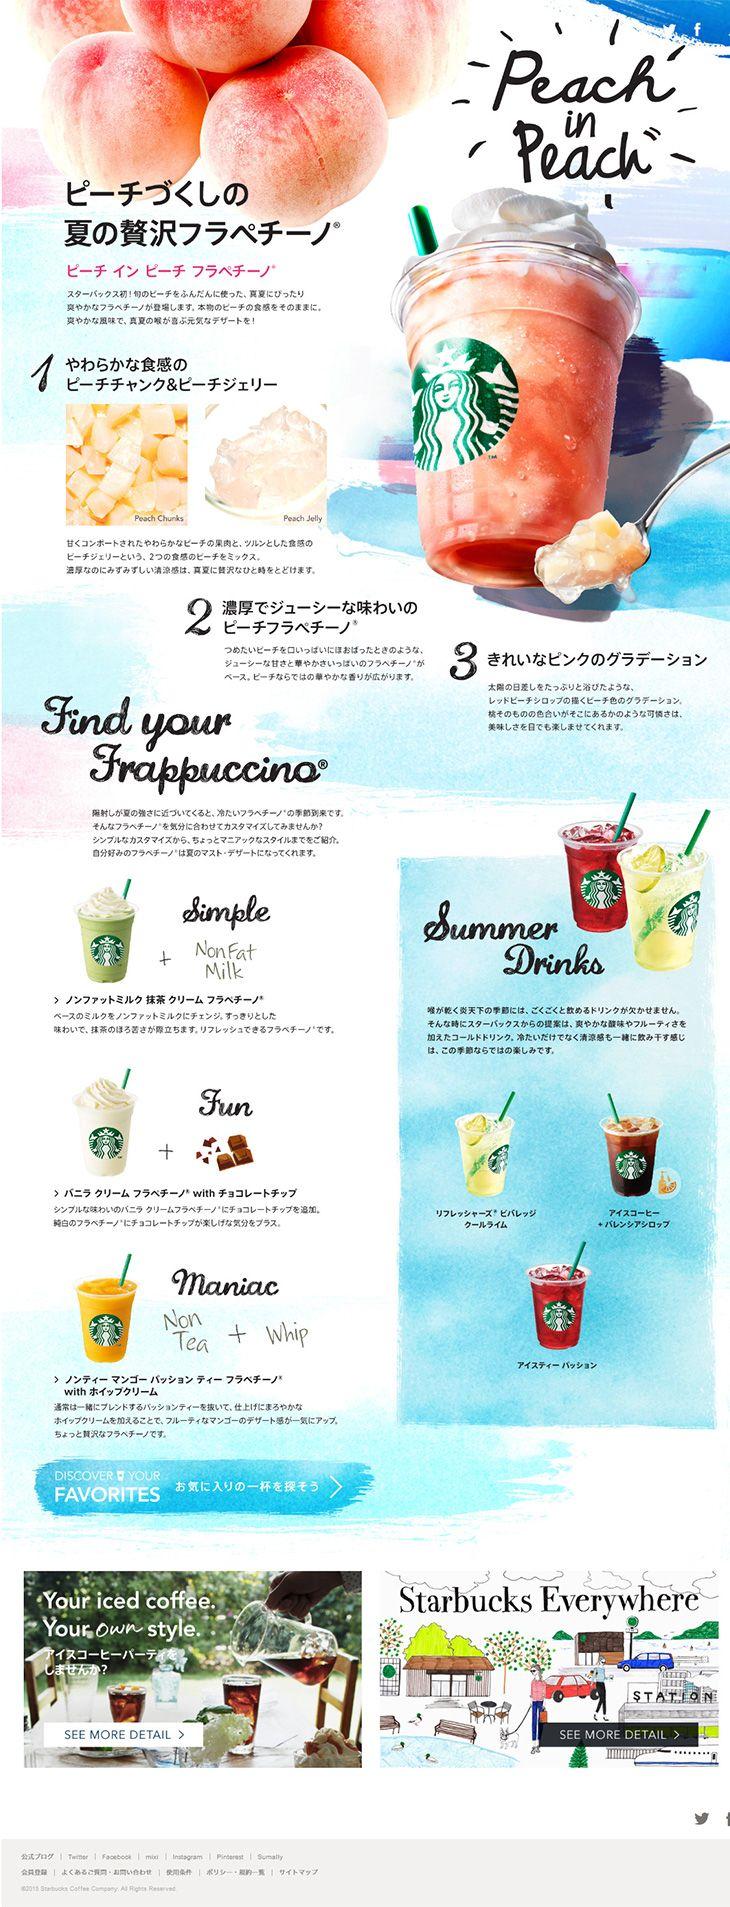 Web design inspiration | Starbucks, Japan and Unique